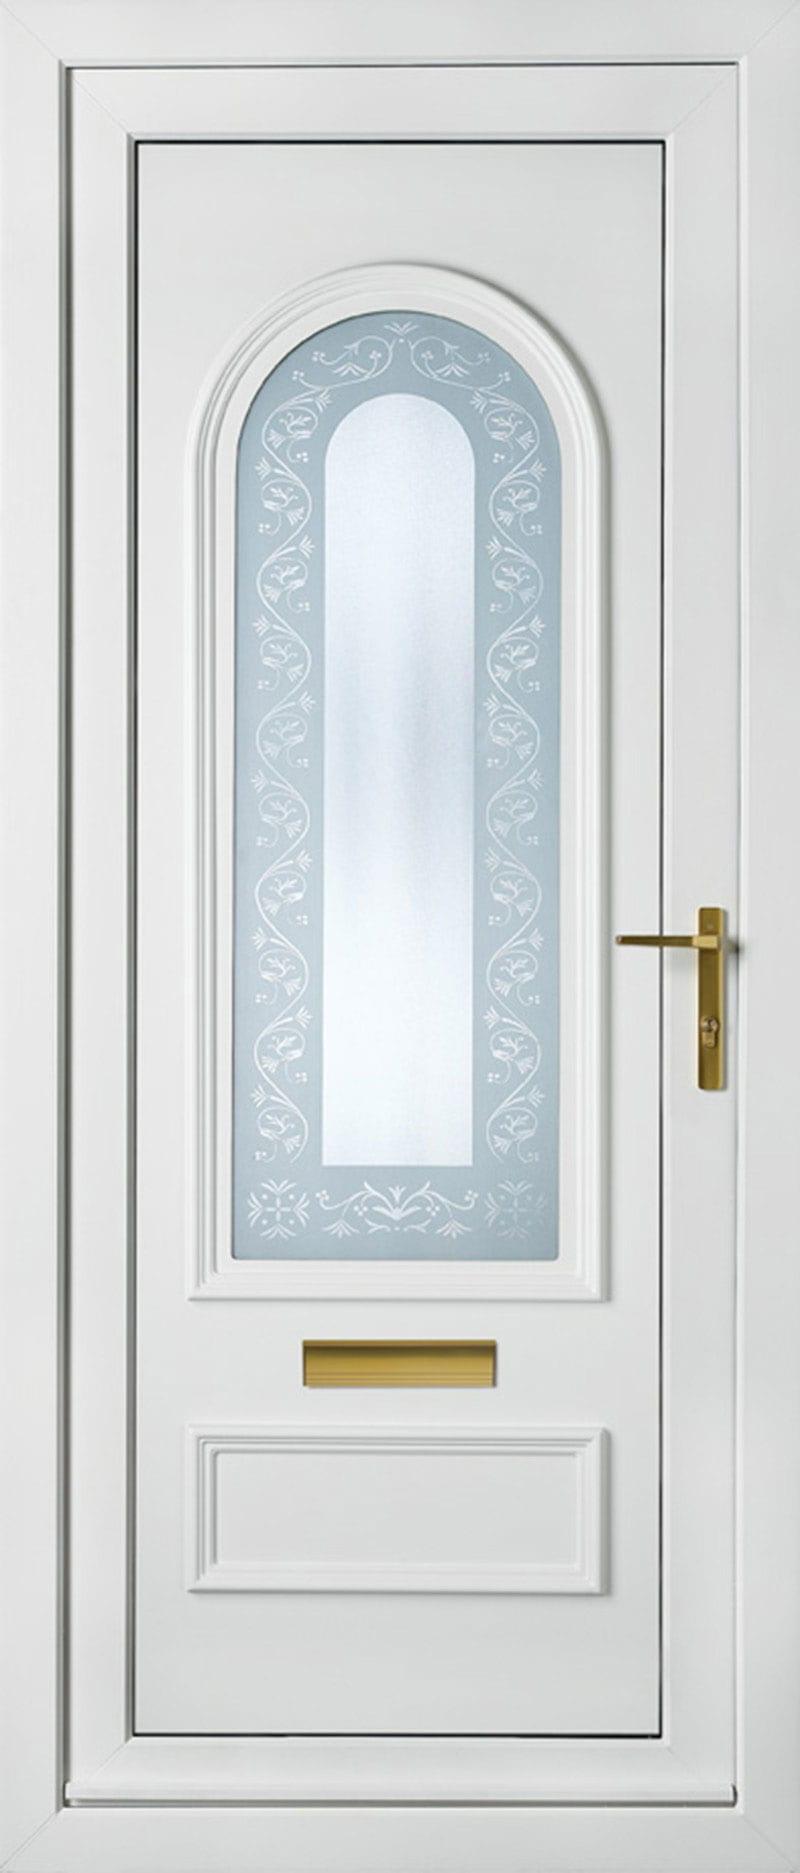 Pvc Doors Uk : Pvc doors and decorative panels dorset windows ltd